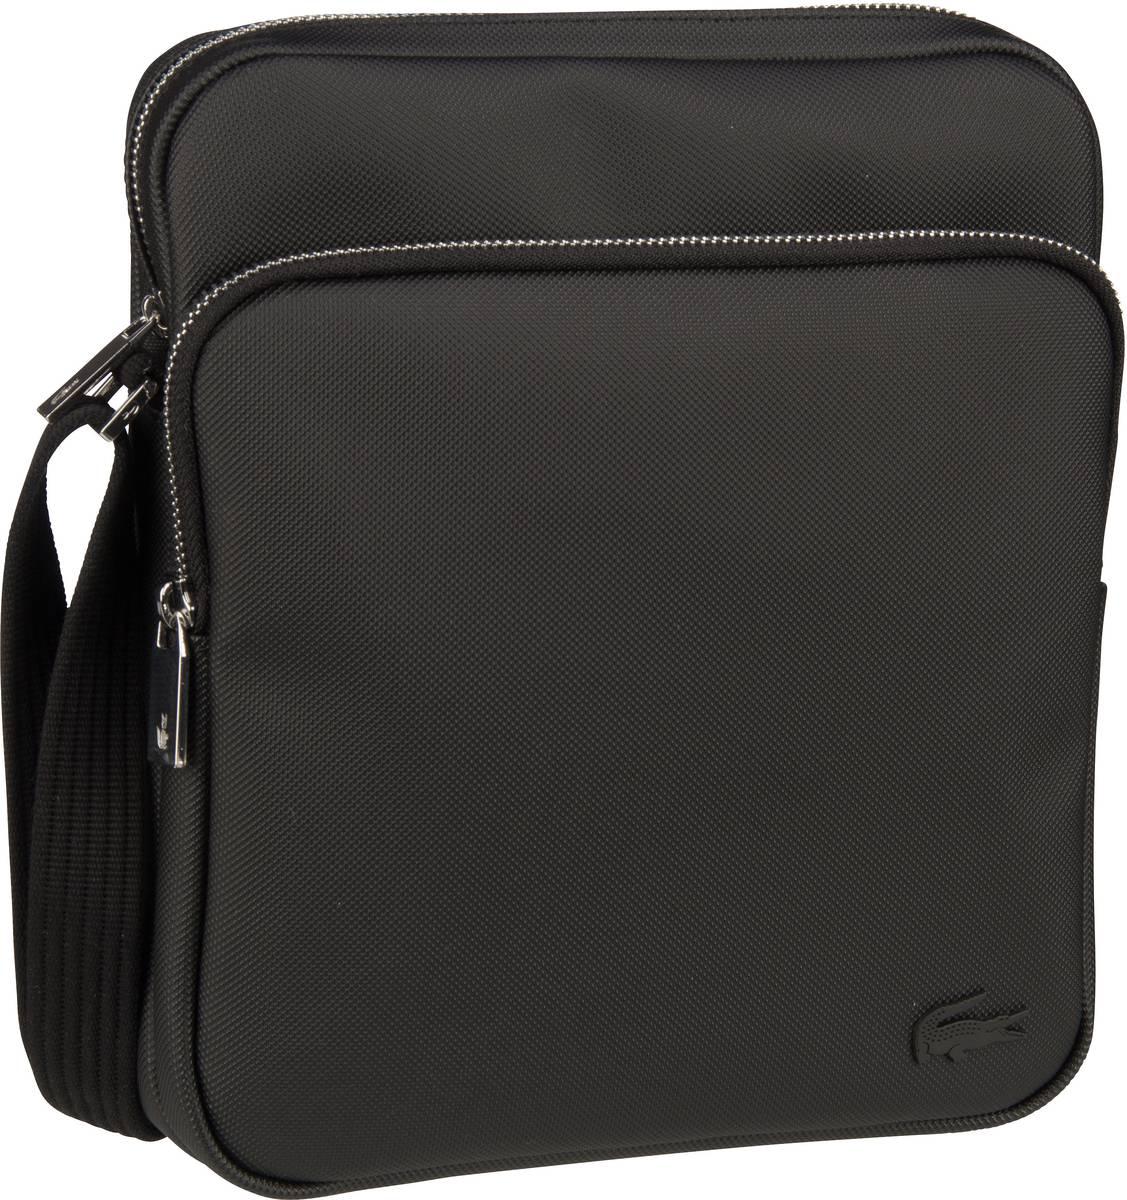 Umhängetasche Crossover Bag 2343 Black